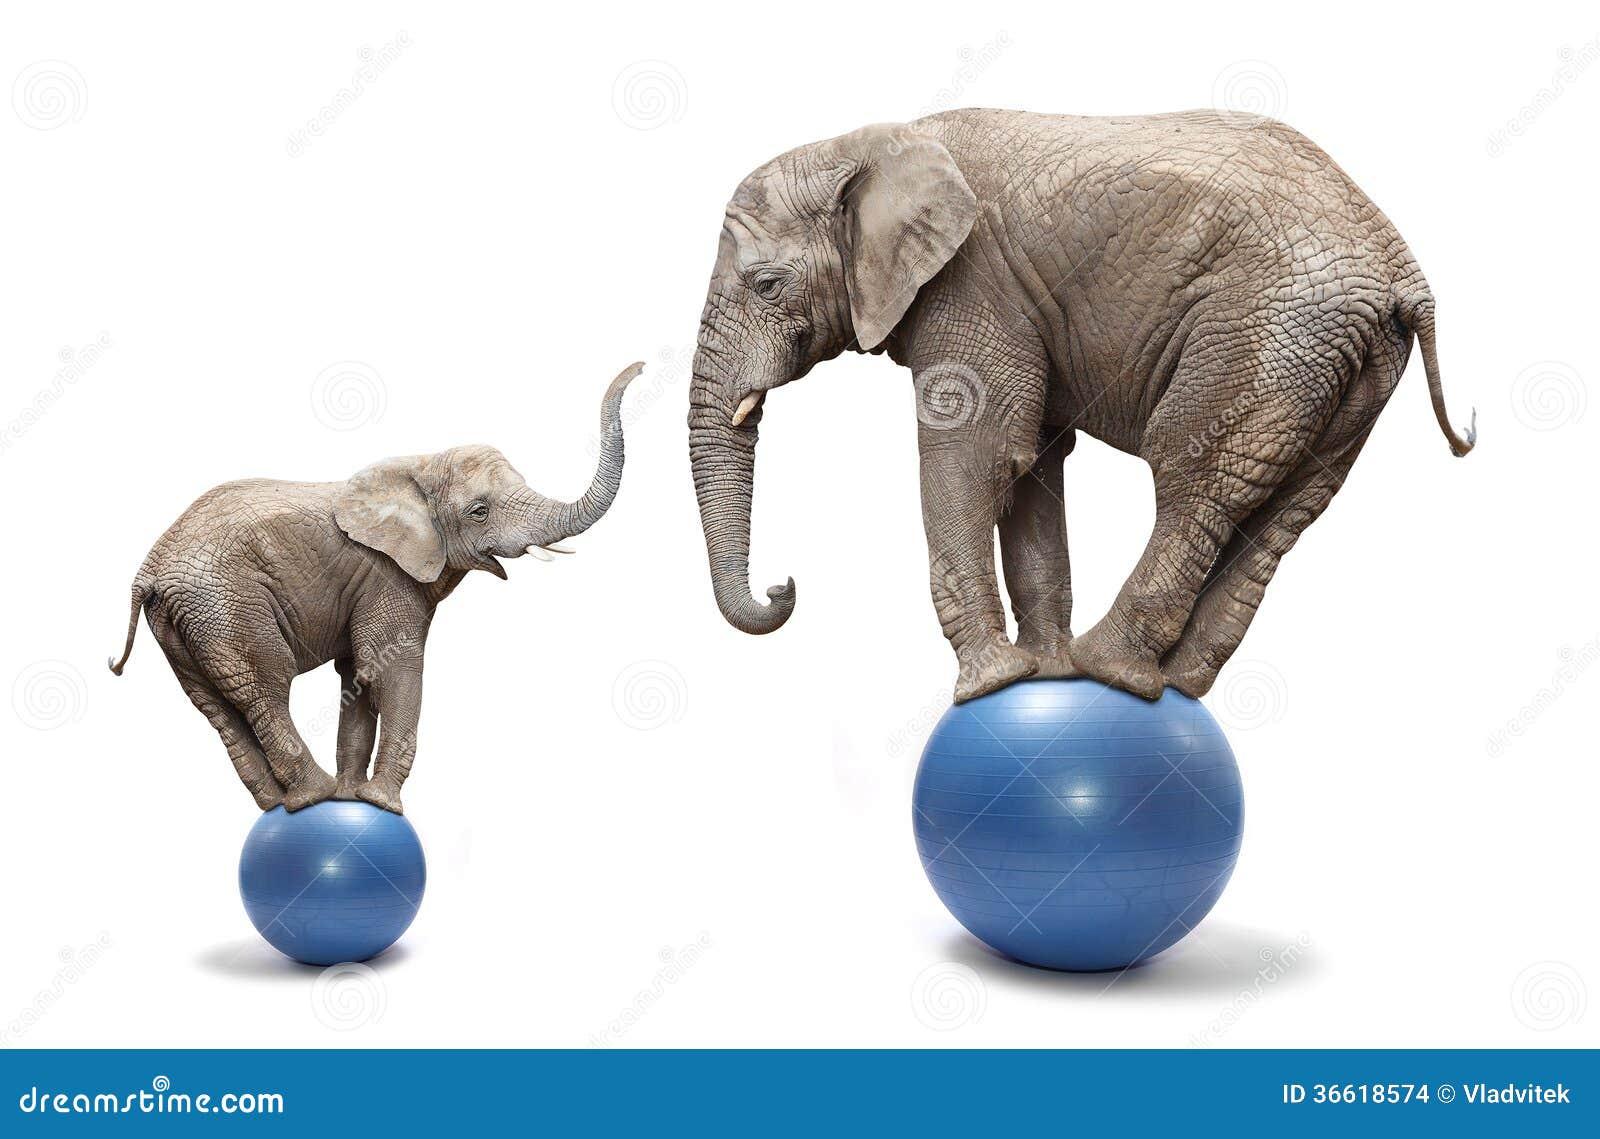 Elephants have a fun.